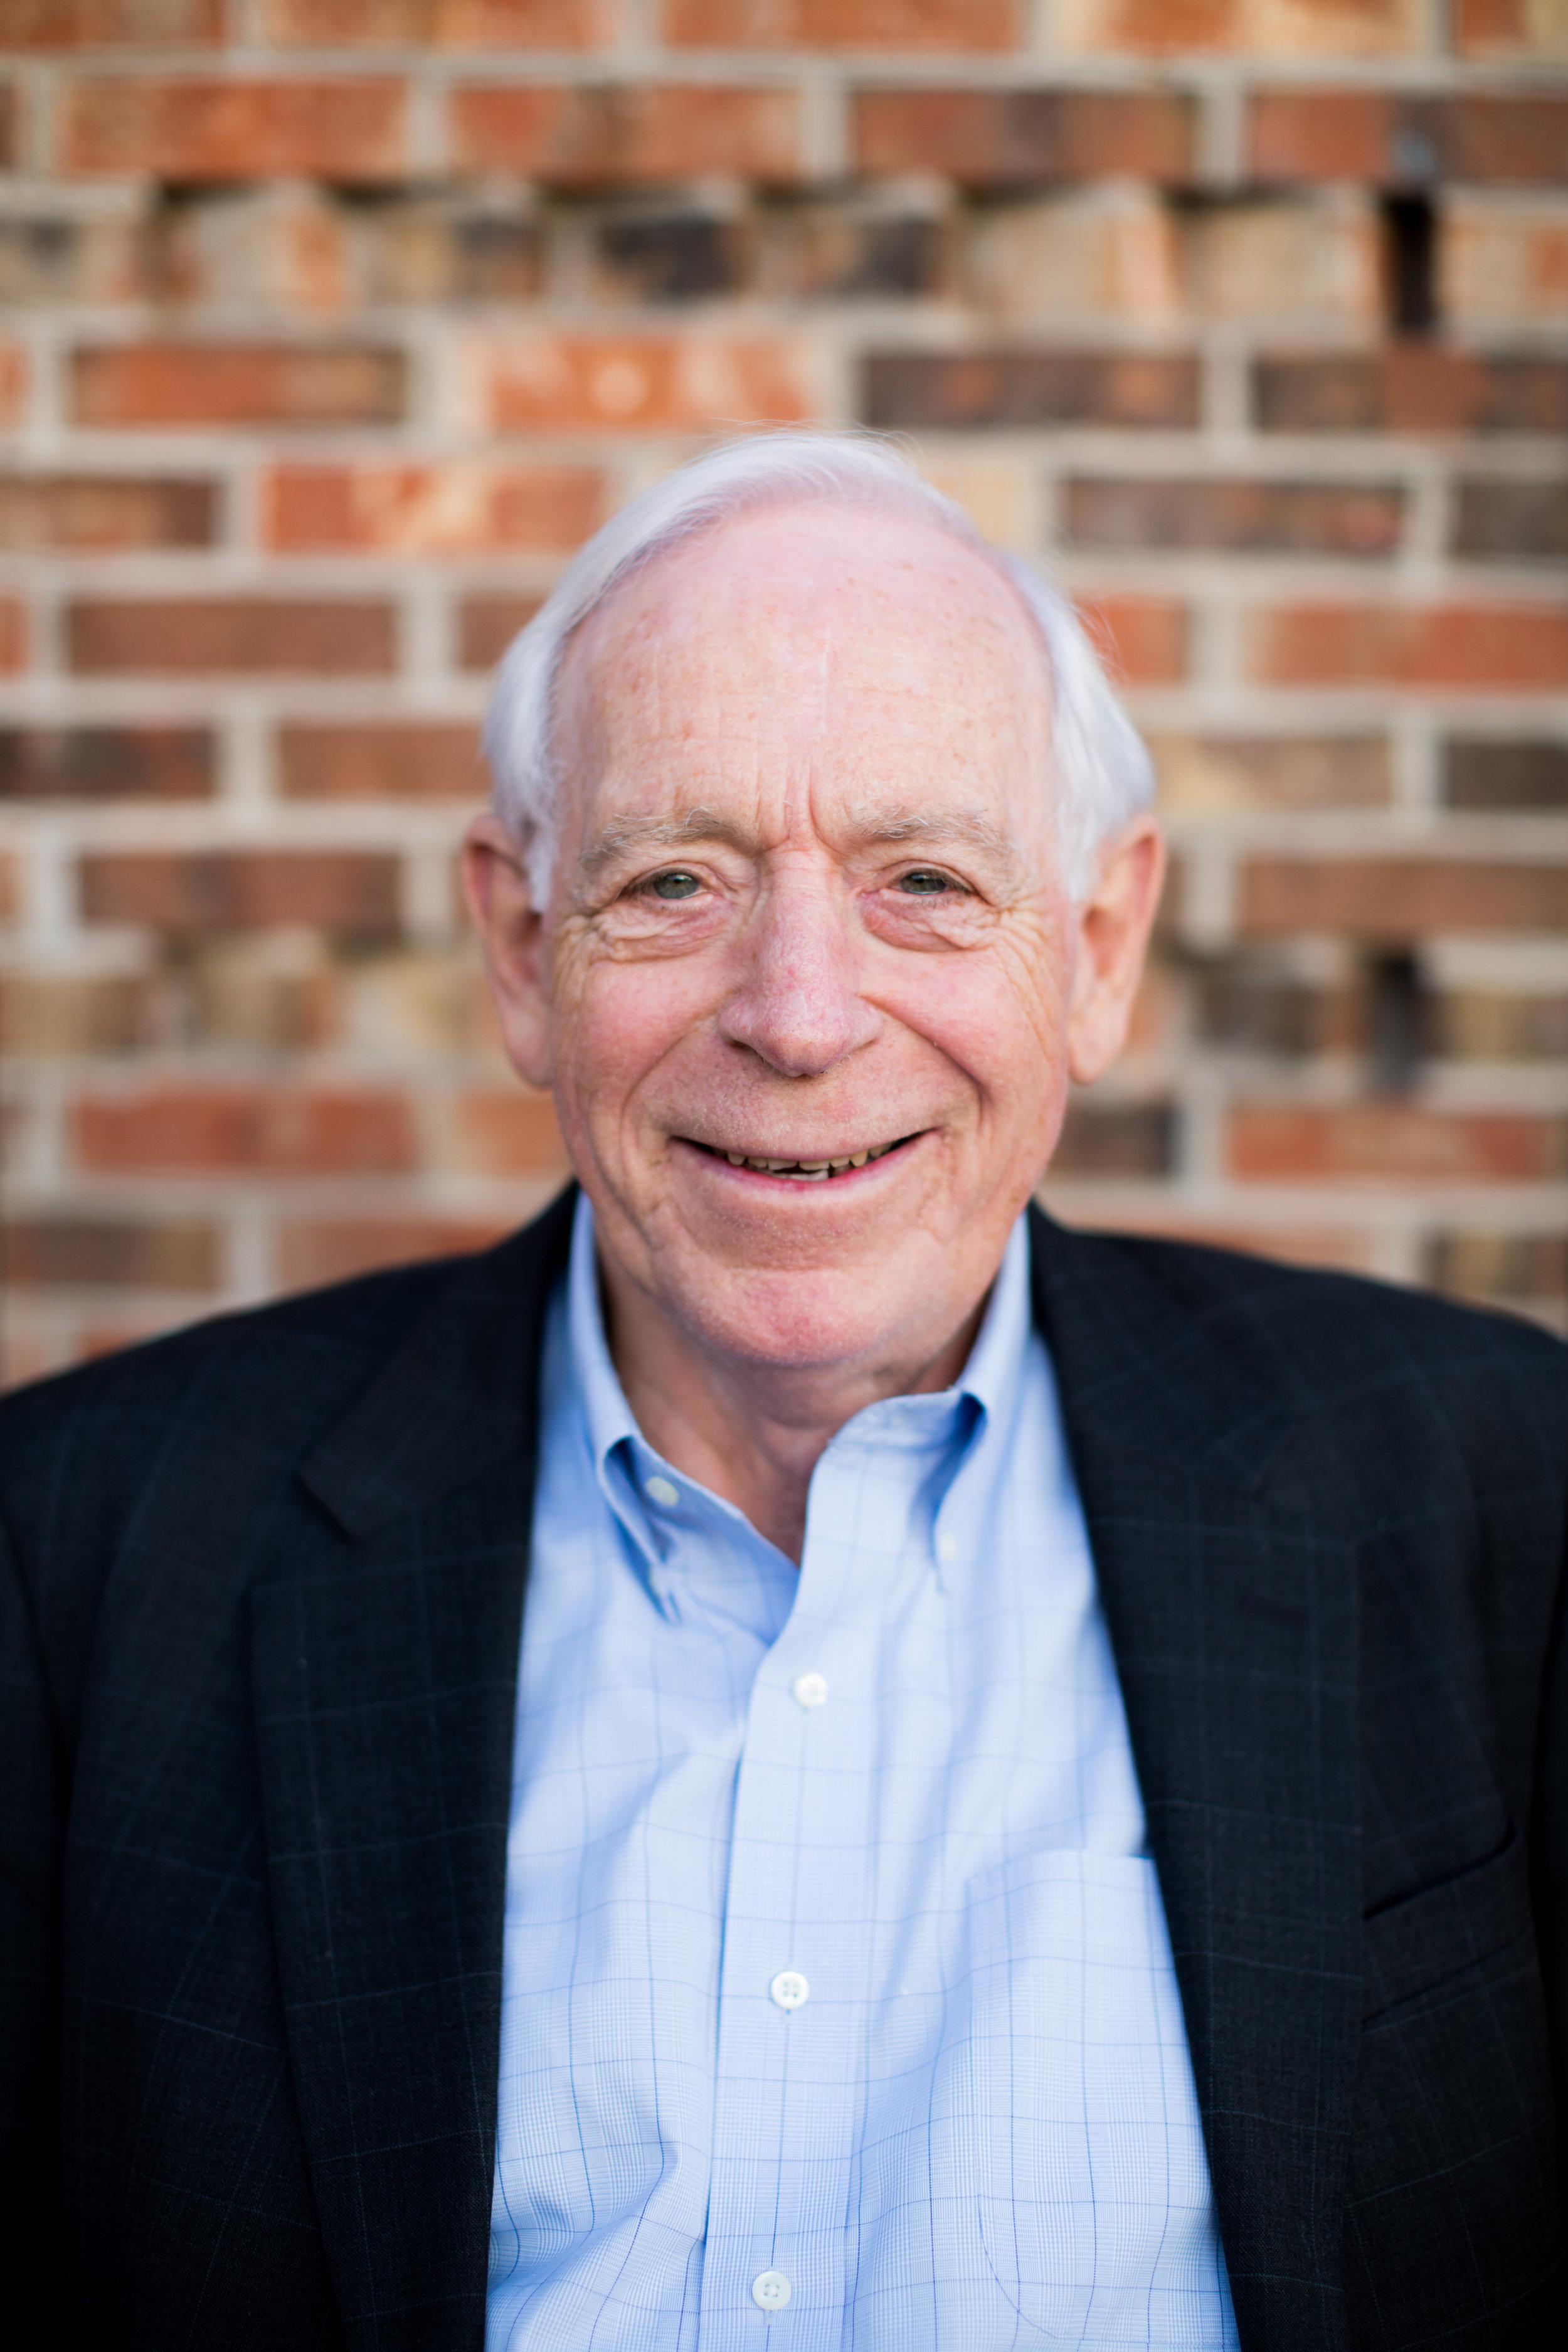 Dr. Jett Pastor Emeritus  Email